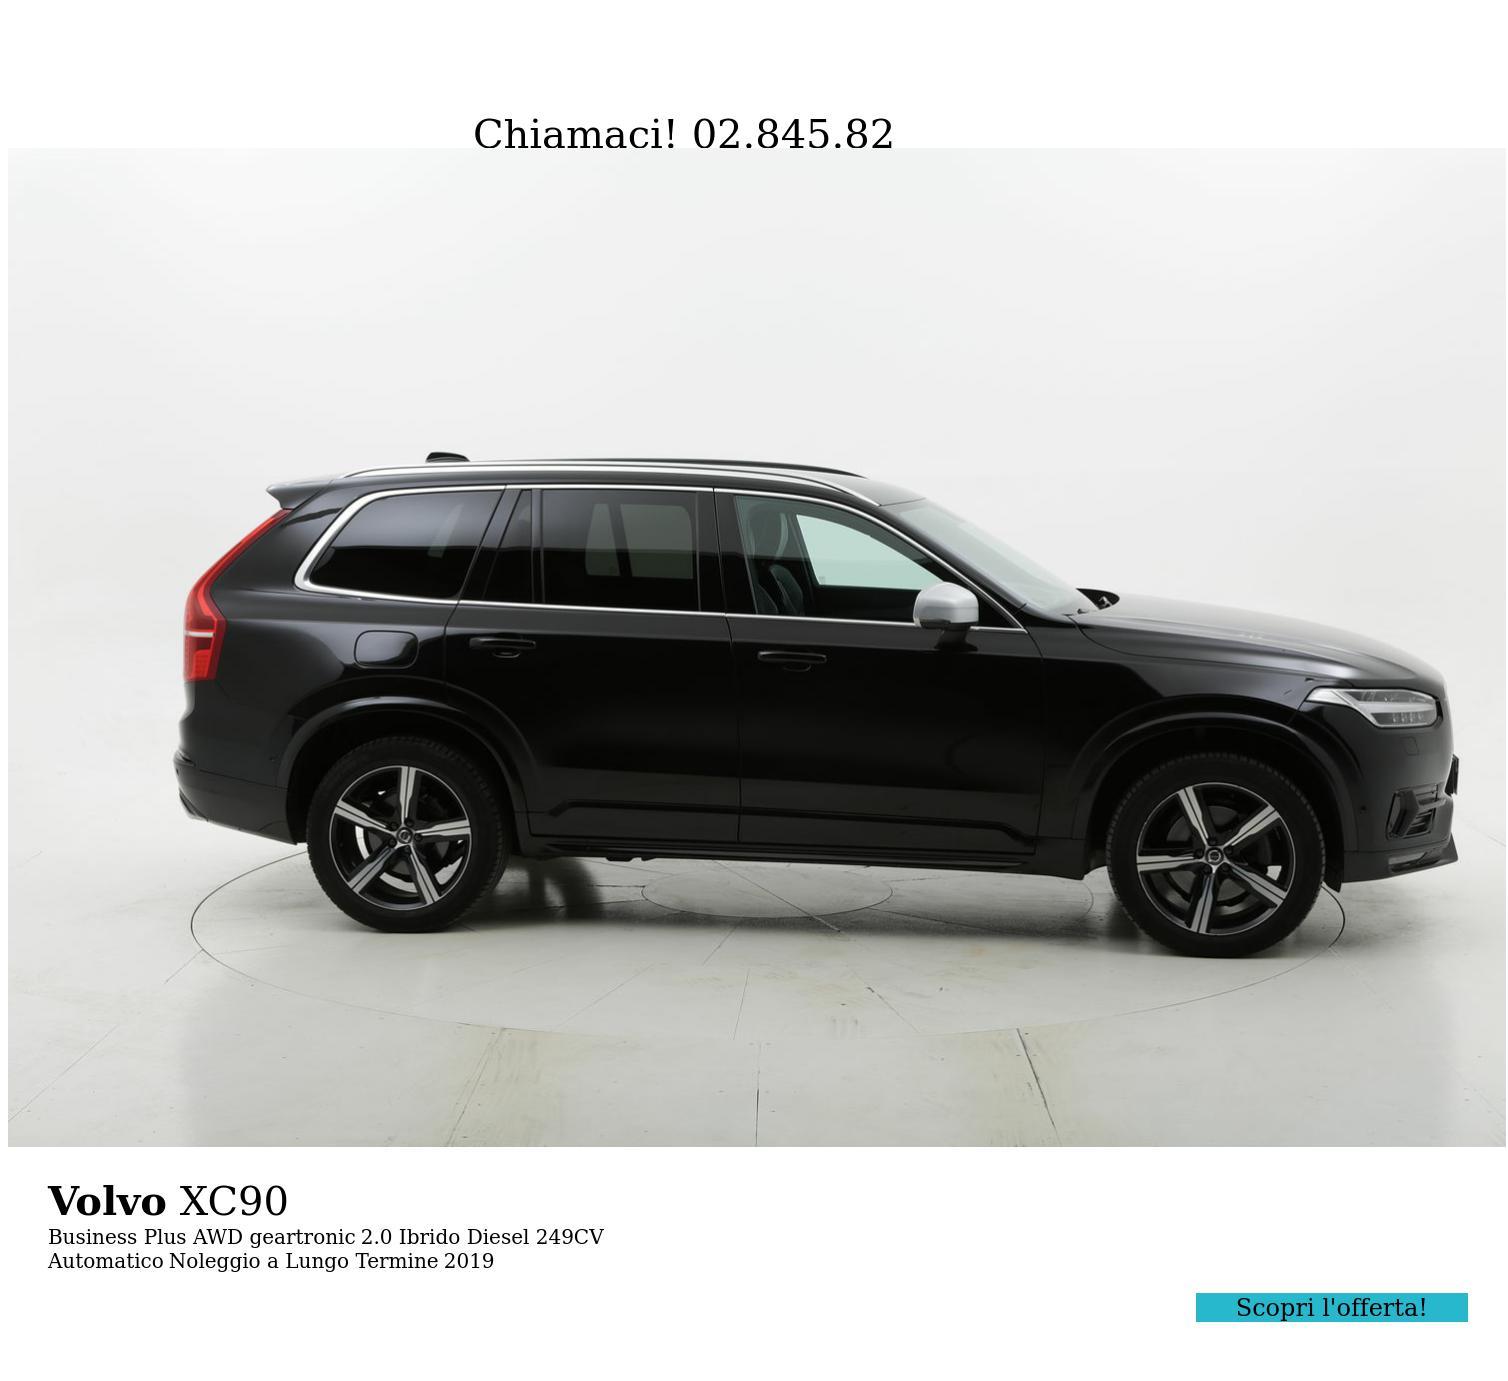 Volvo XC90 Business Plus AWD geartronic ibrido diesel nera a noleggio a lungo termine | brumbrum